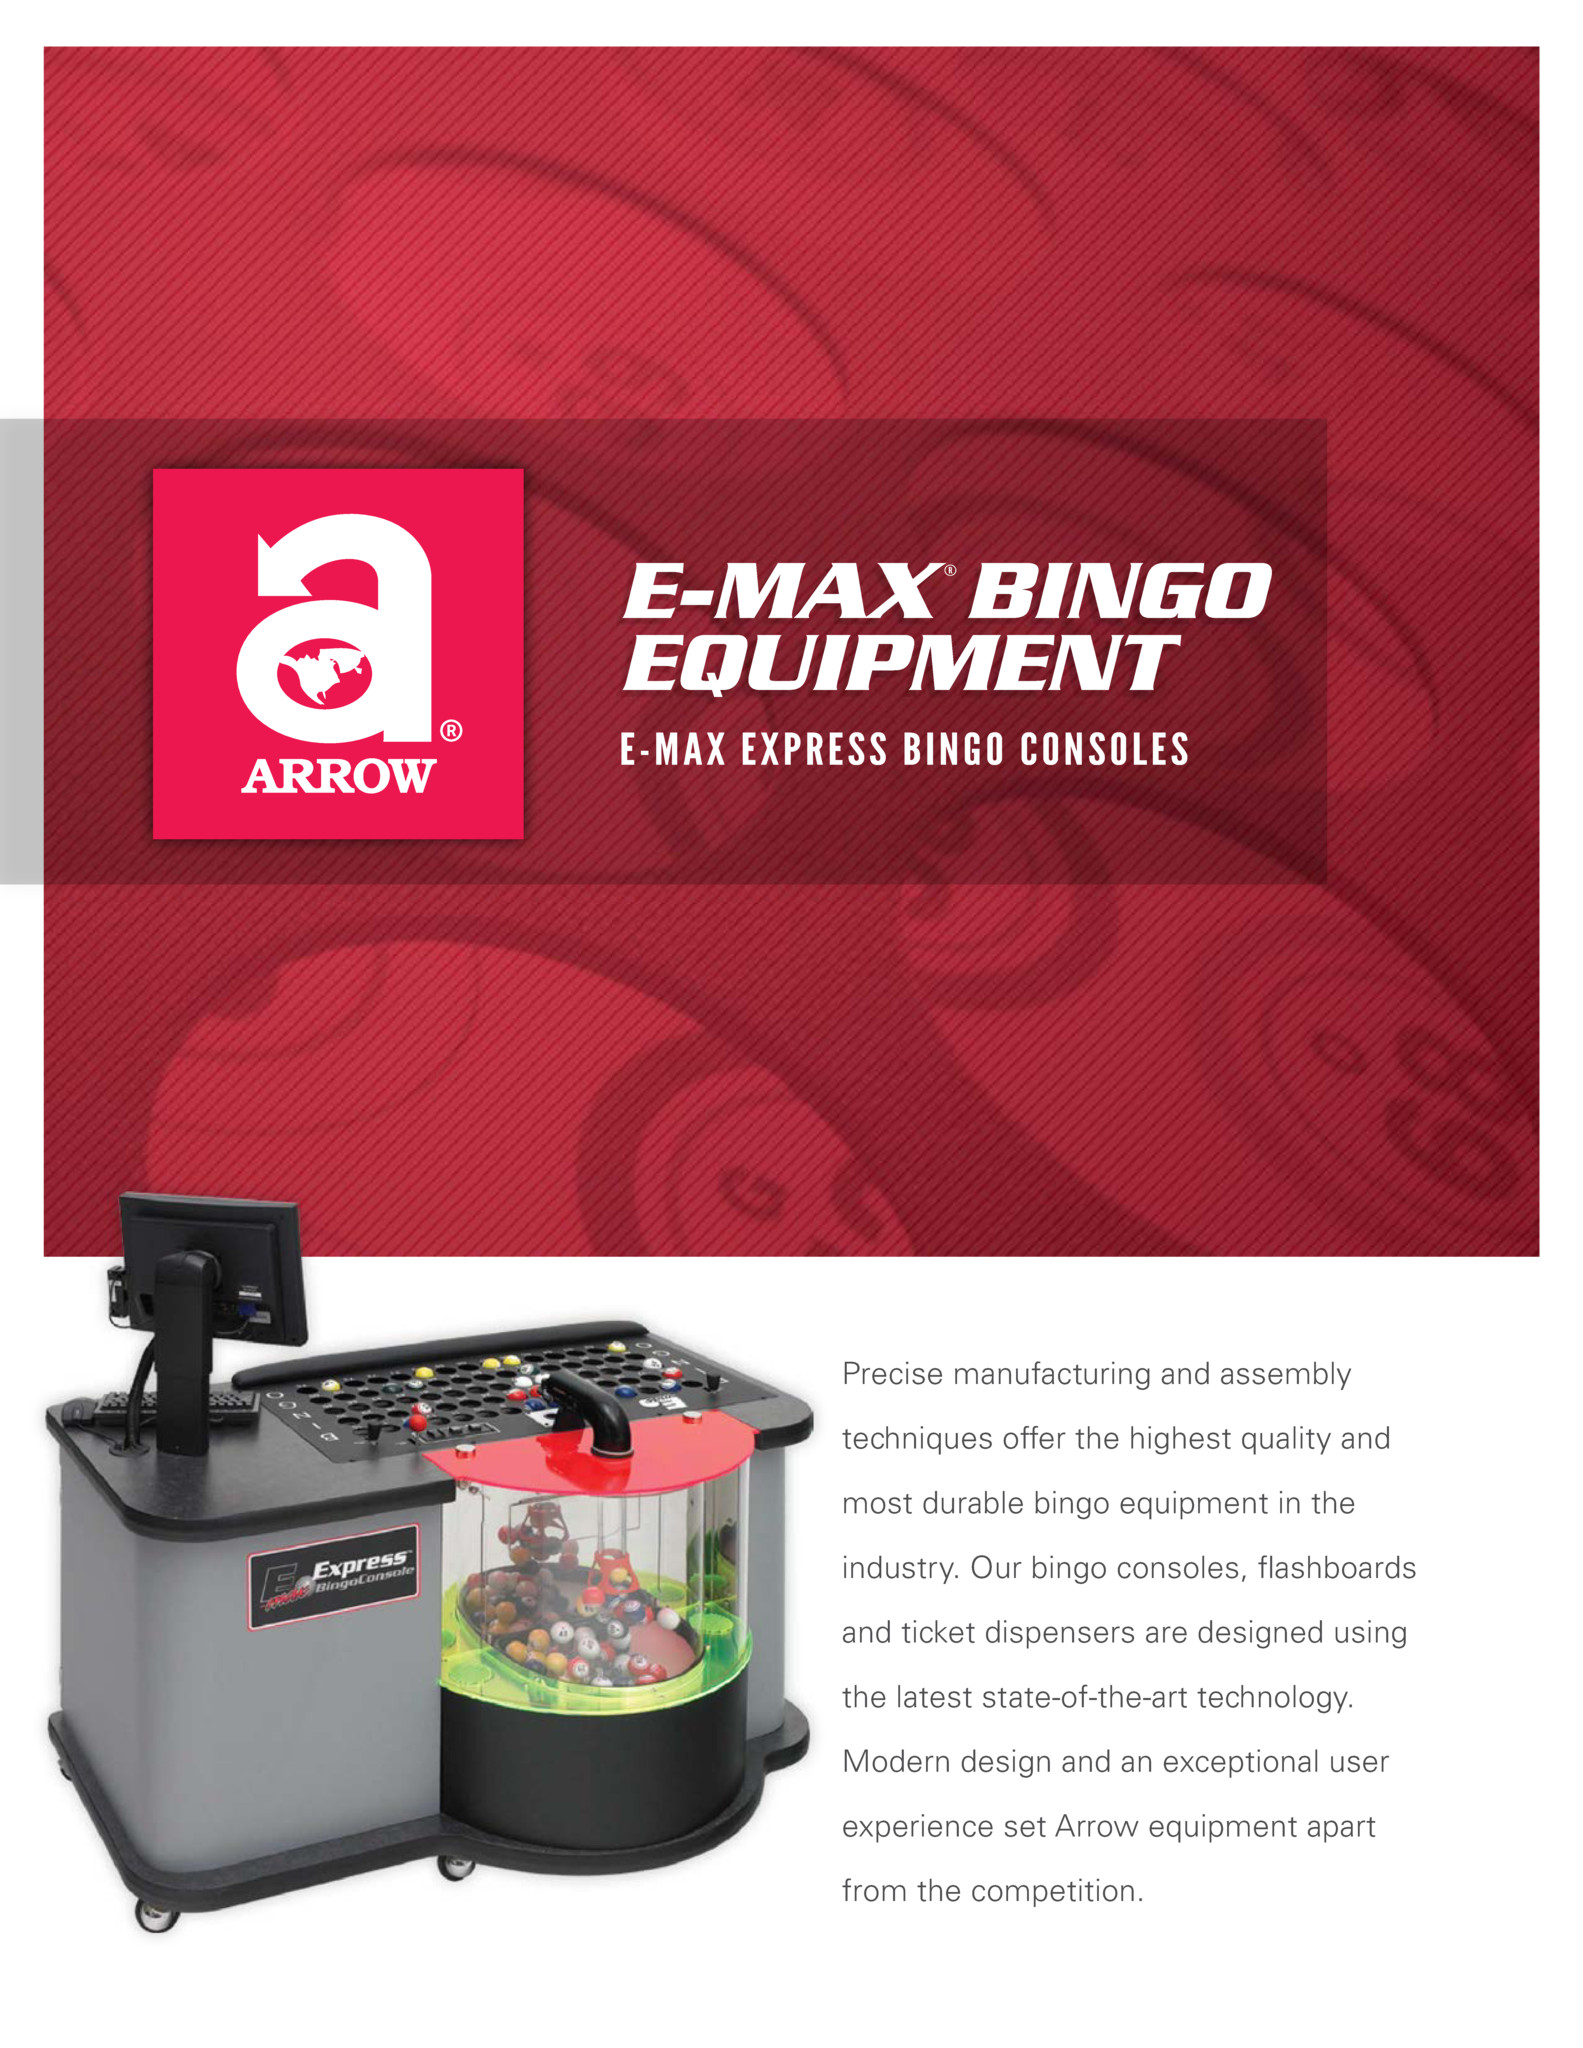 E-max Express Bingo Console Flyer Promotional Materials/Equipment Flyers & Brochures